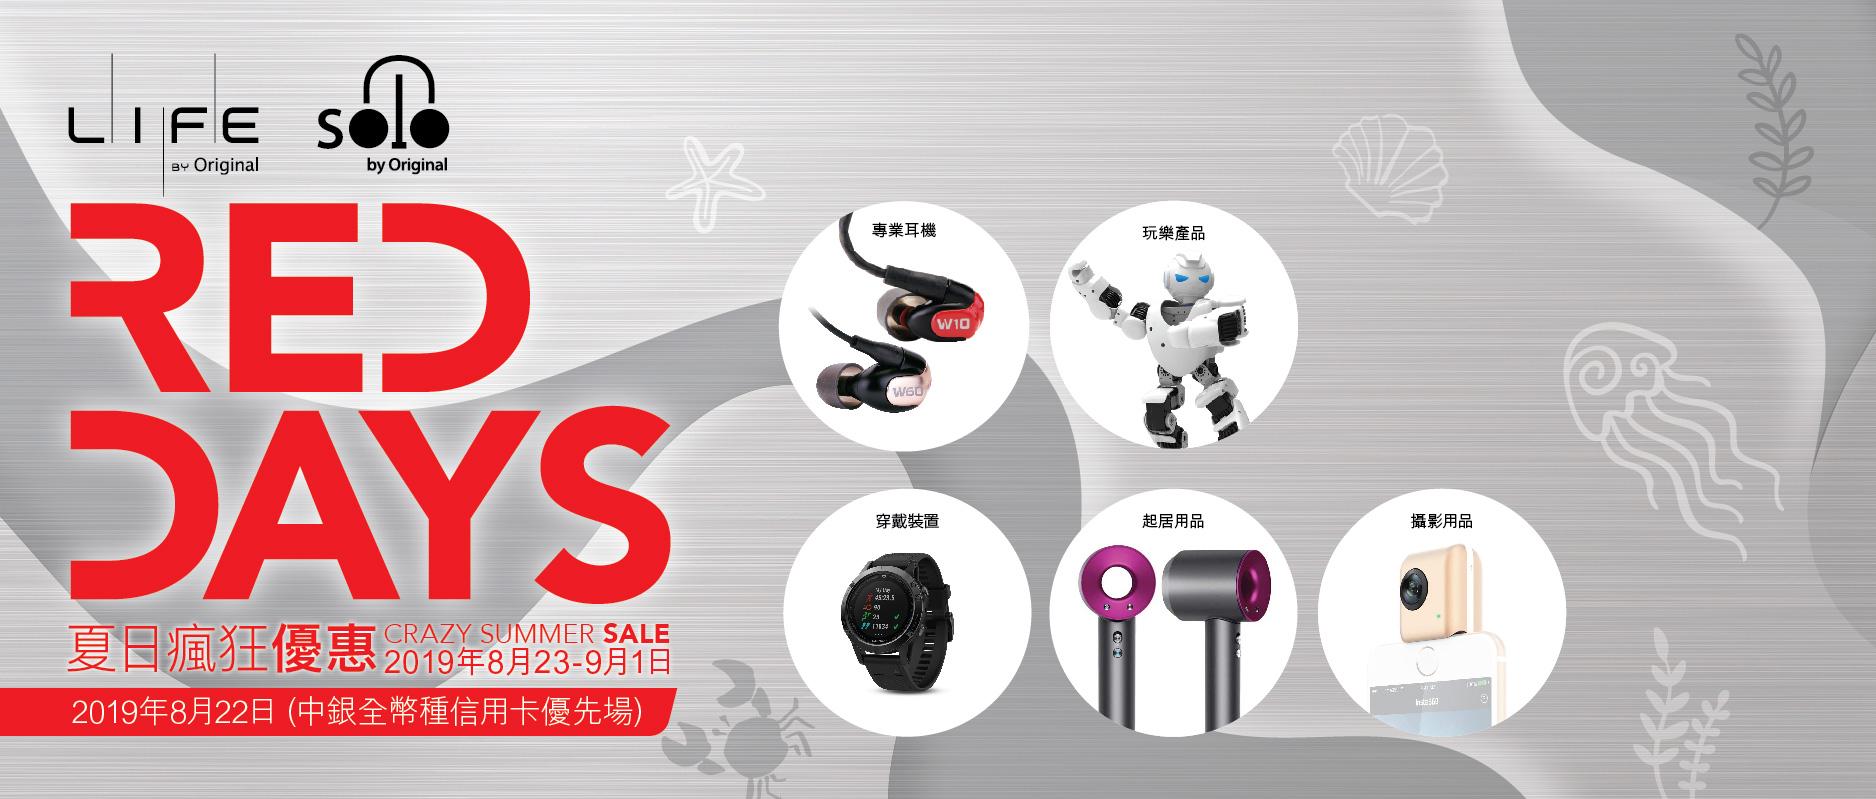 Red Days 夏日勁減狂熱|Summer Shopping Spree